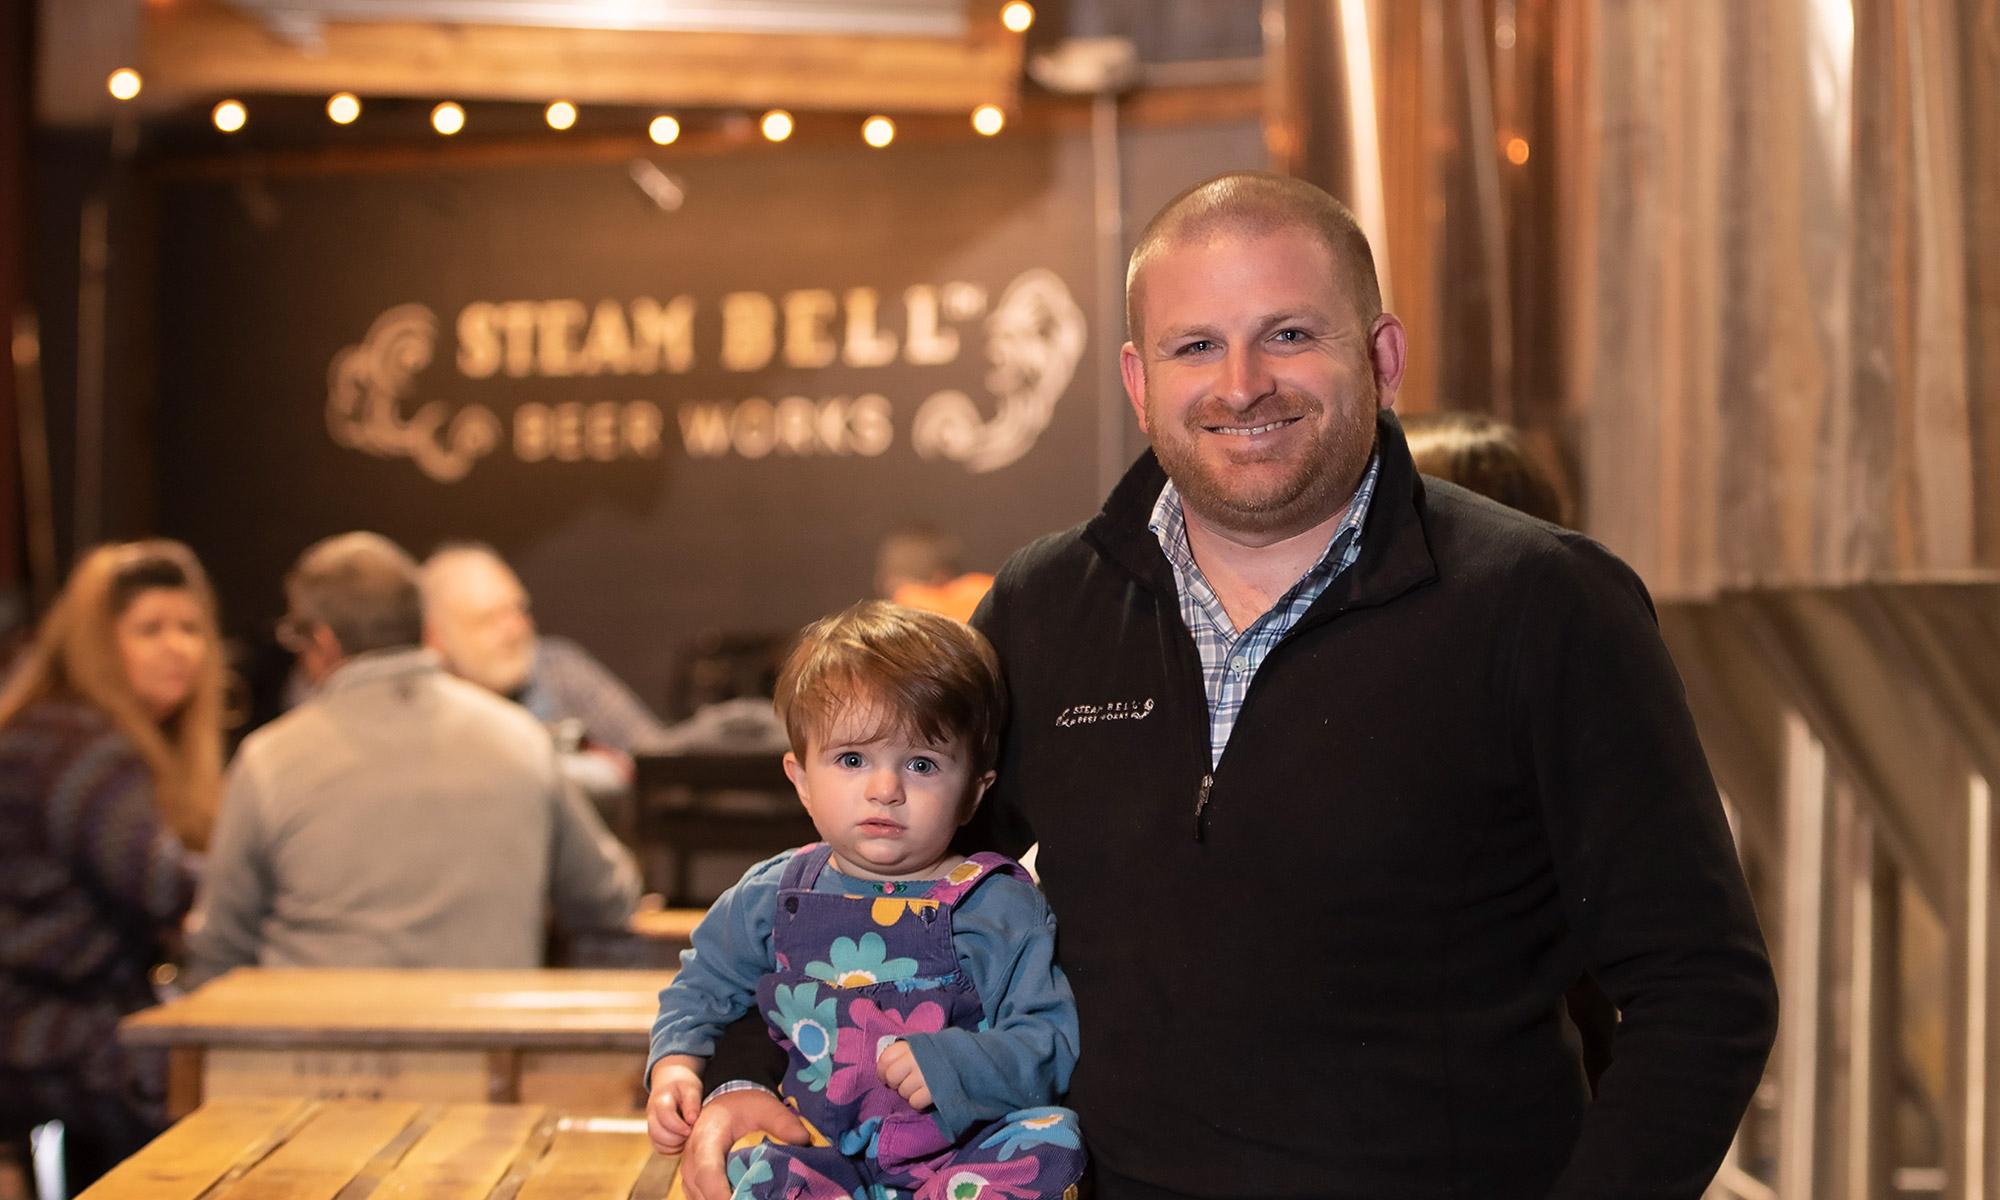 Brad Cooper with daughter Caroline - Steam Bell Beer Works